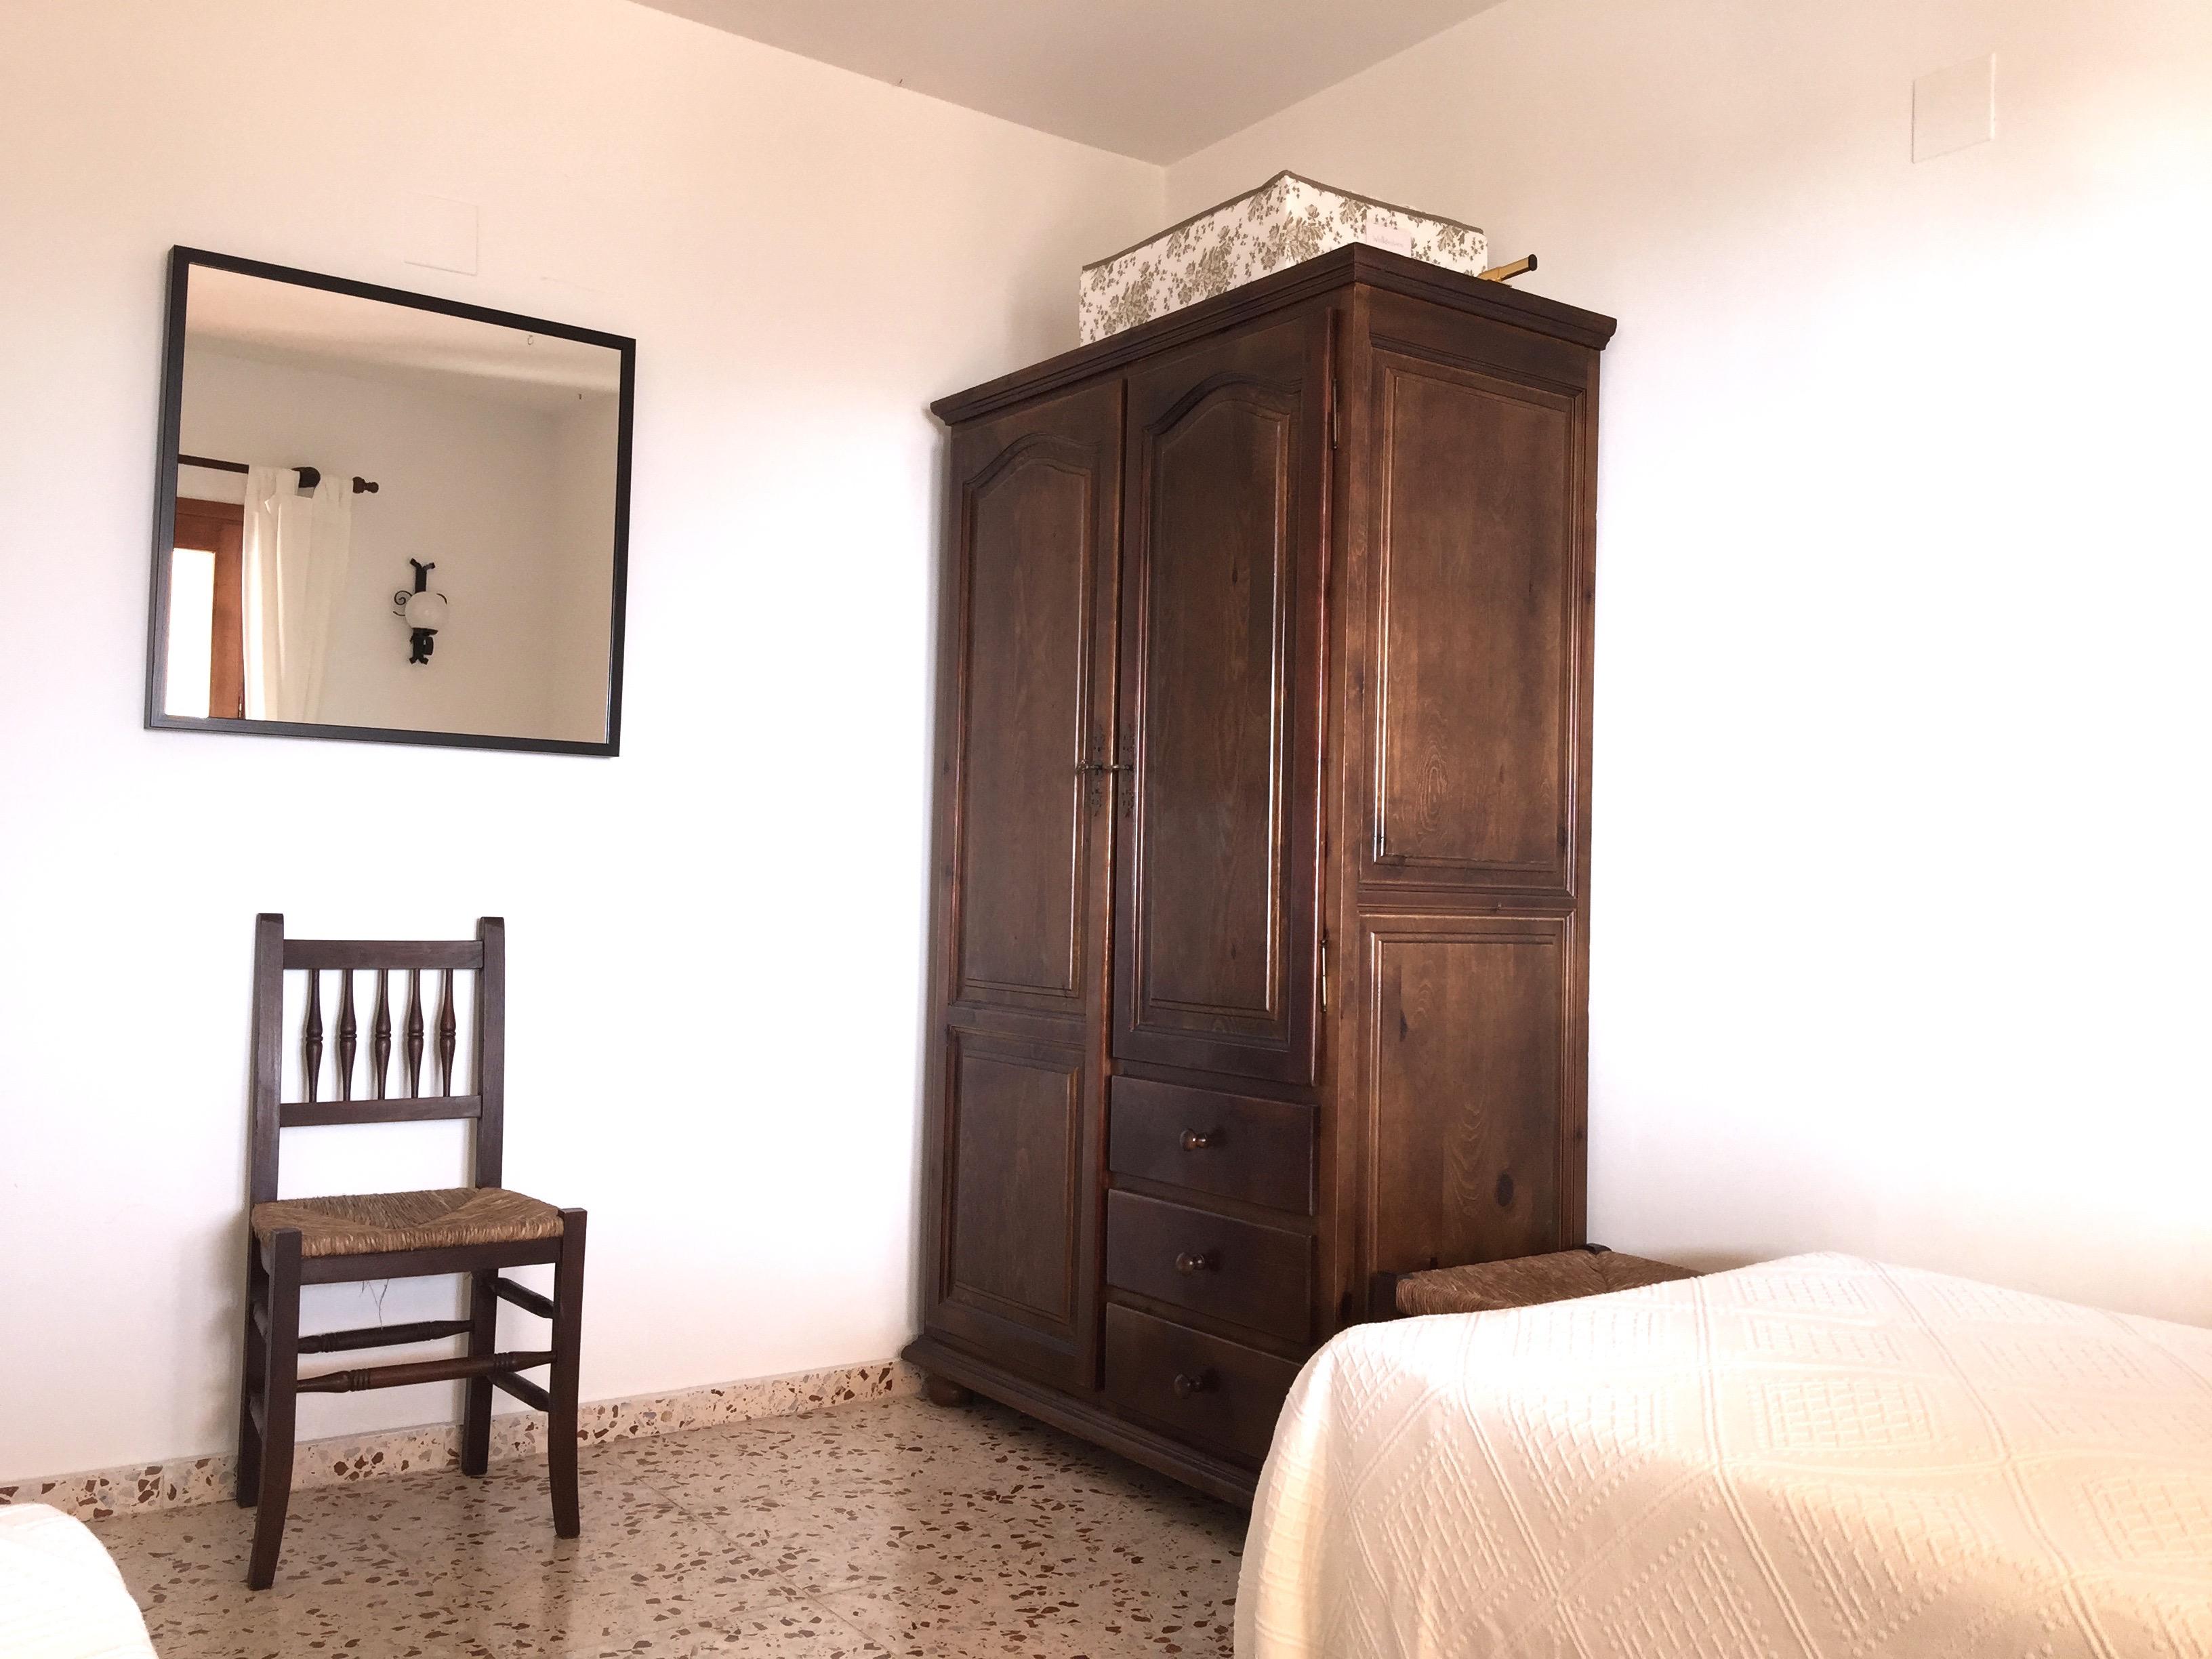 casacalpe olta schlafzimmer 2 3 casacalpe. Black Bedroom Furniture Sets. Home Design Ideas